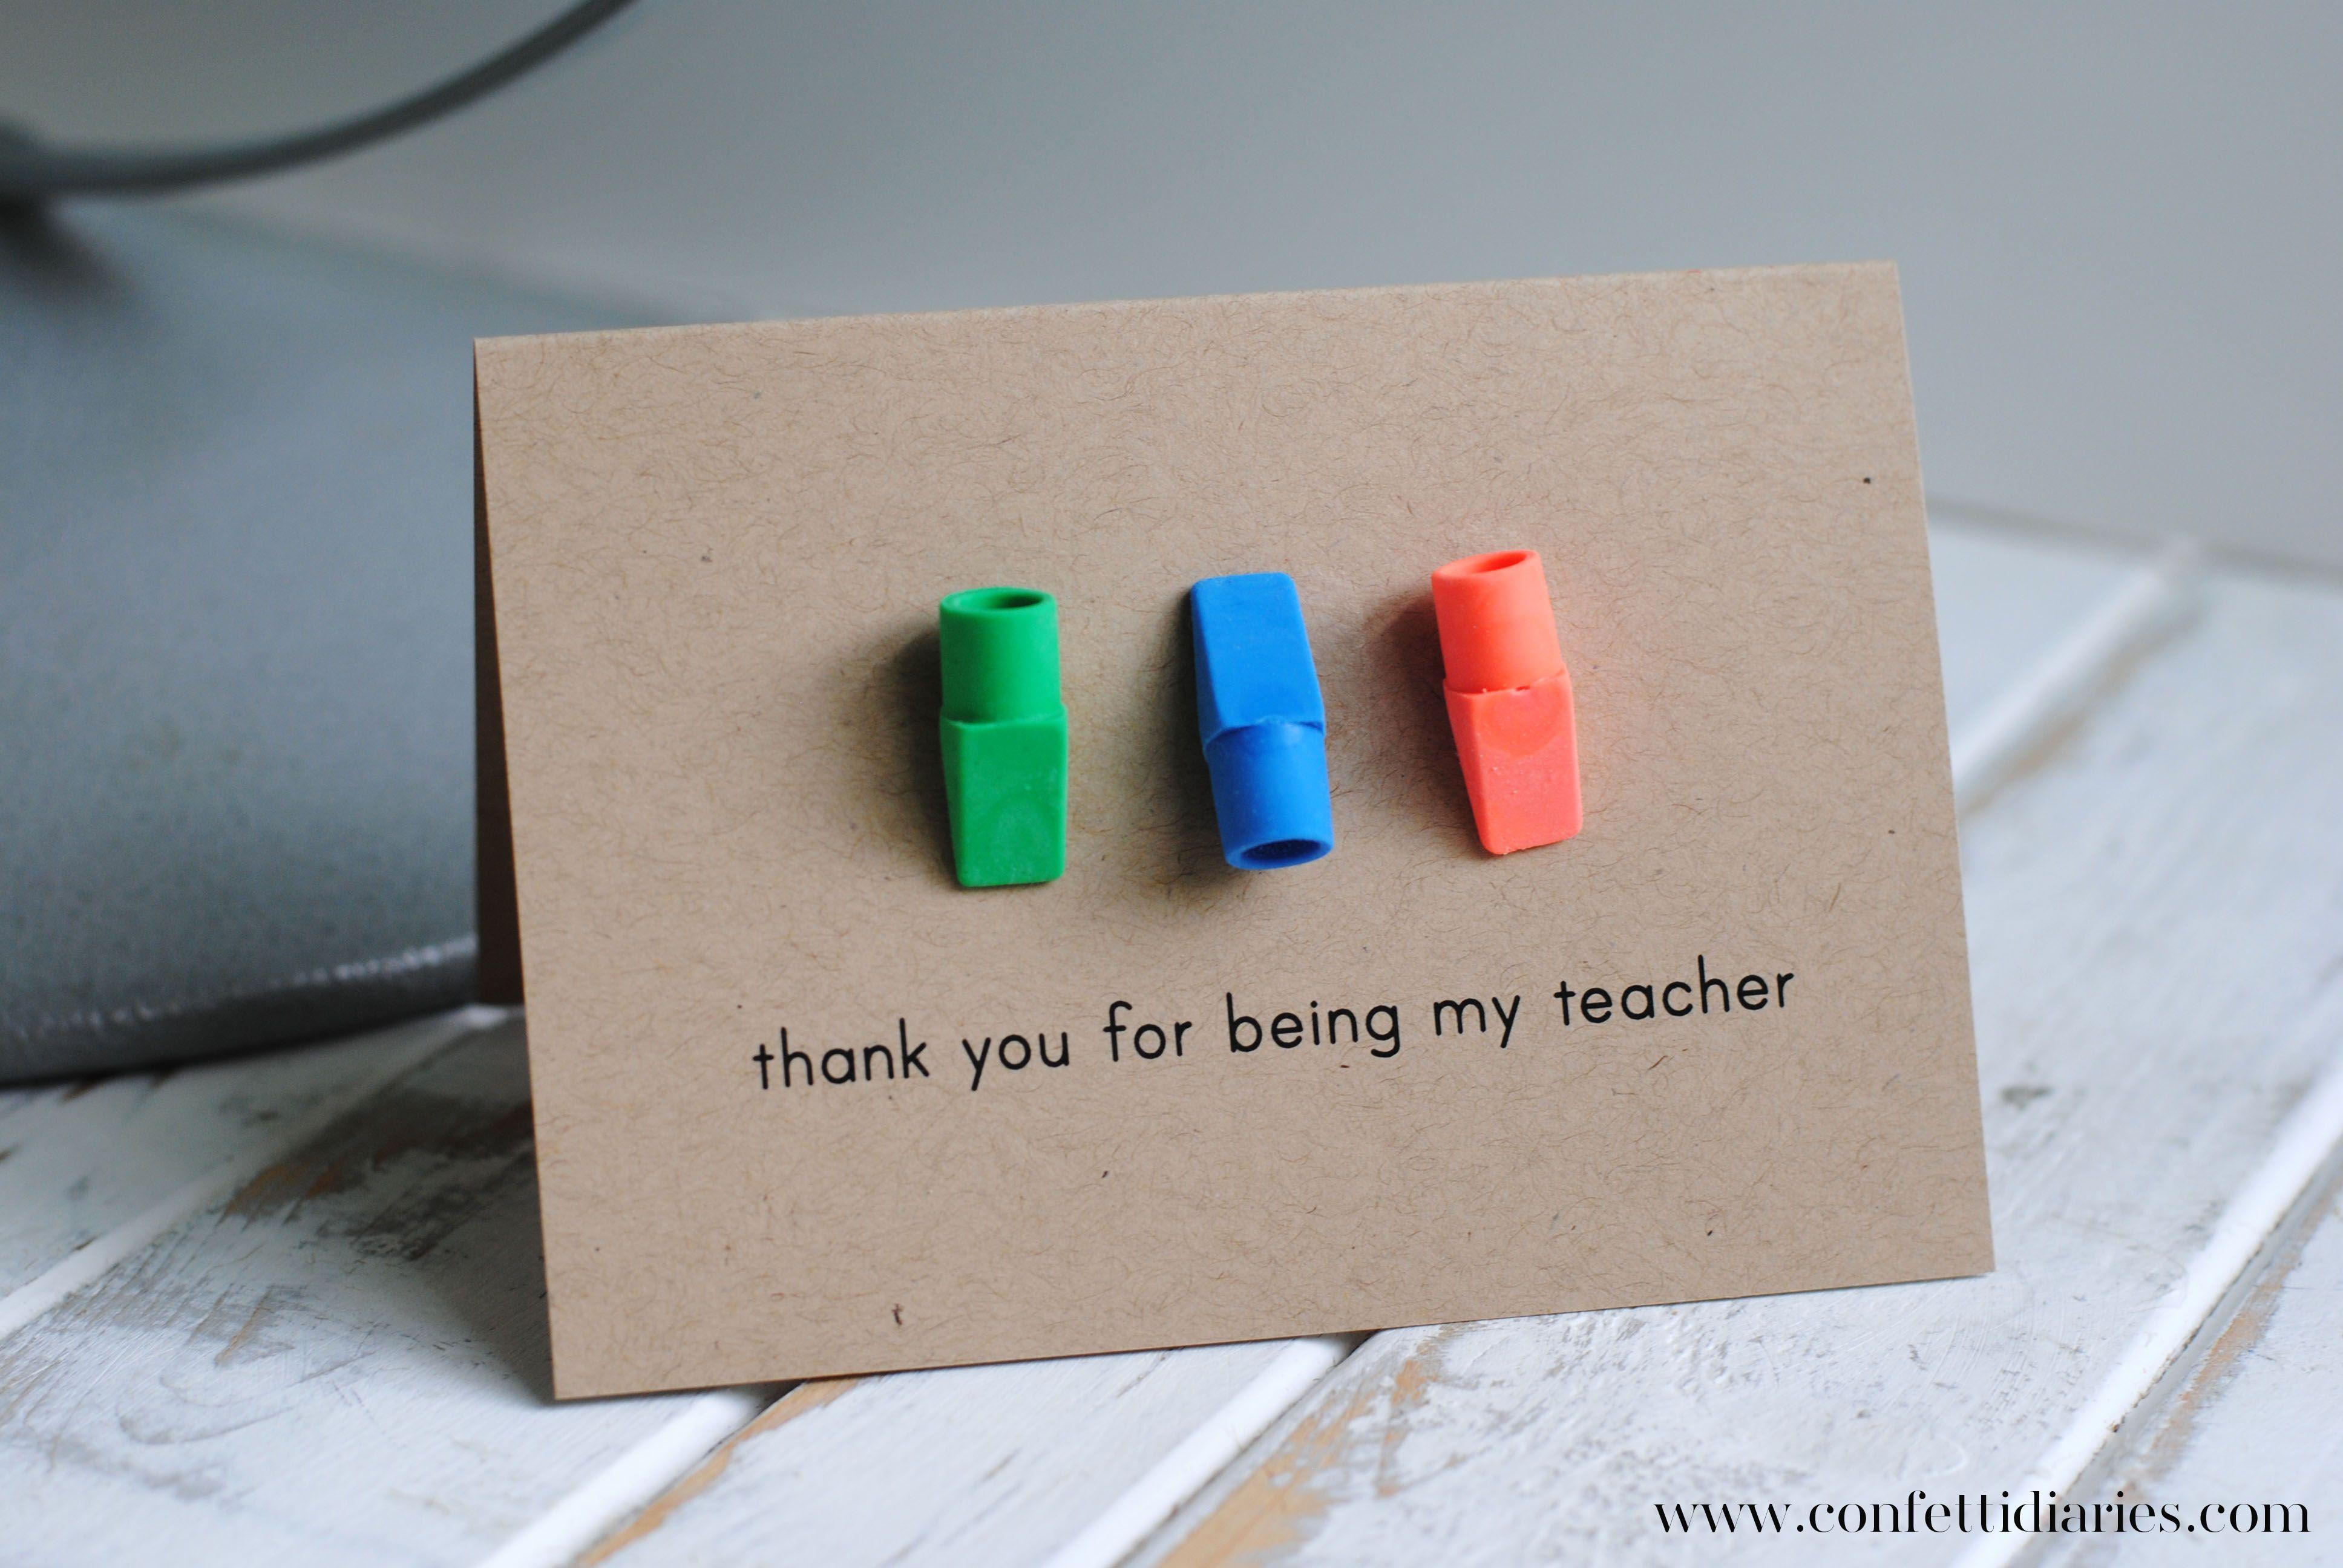 Katarinas paperie teacher thank you cards teacher